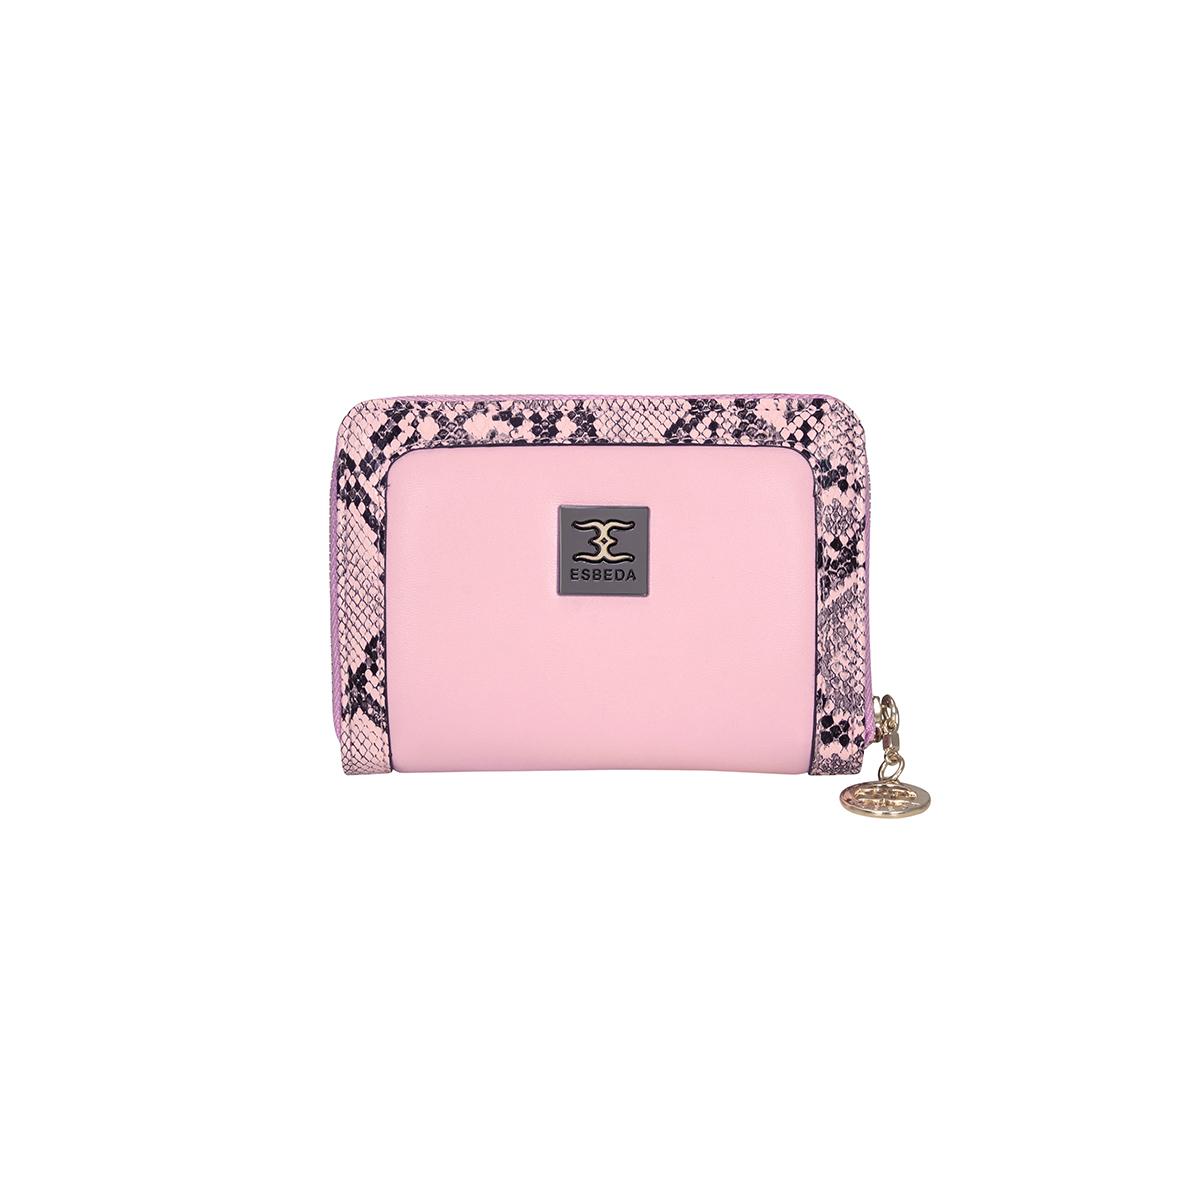 ESBEDA | ESBEDA Baby Pink Color Printed Animal Textured Wallet For Women